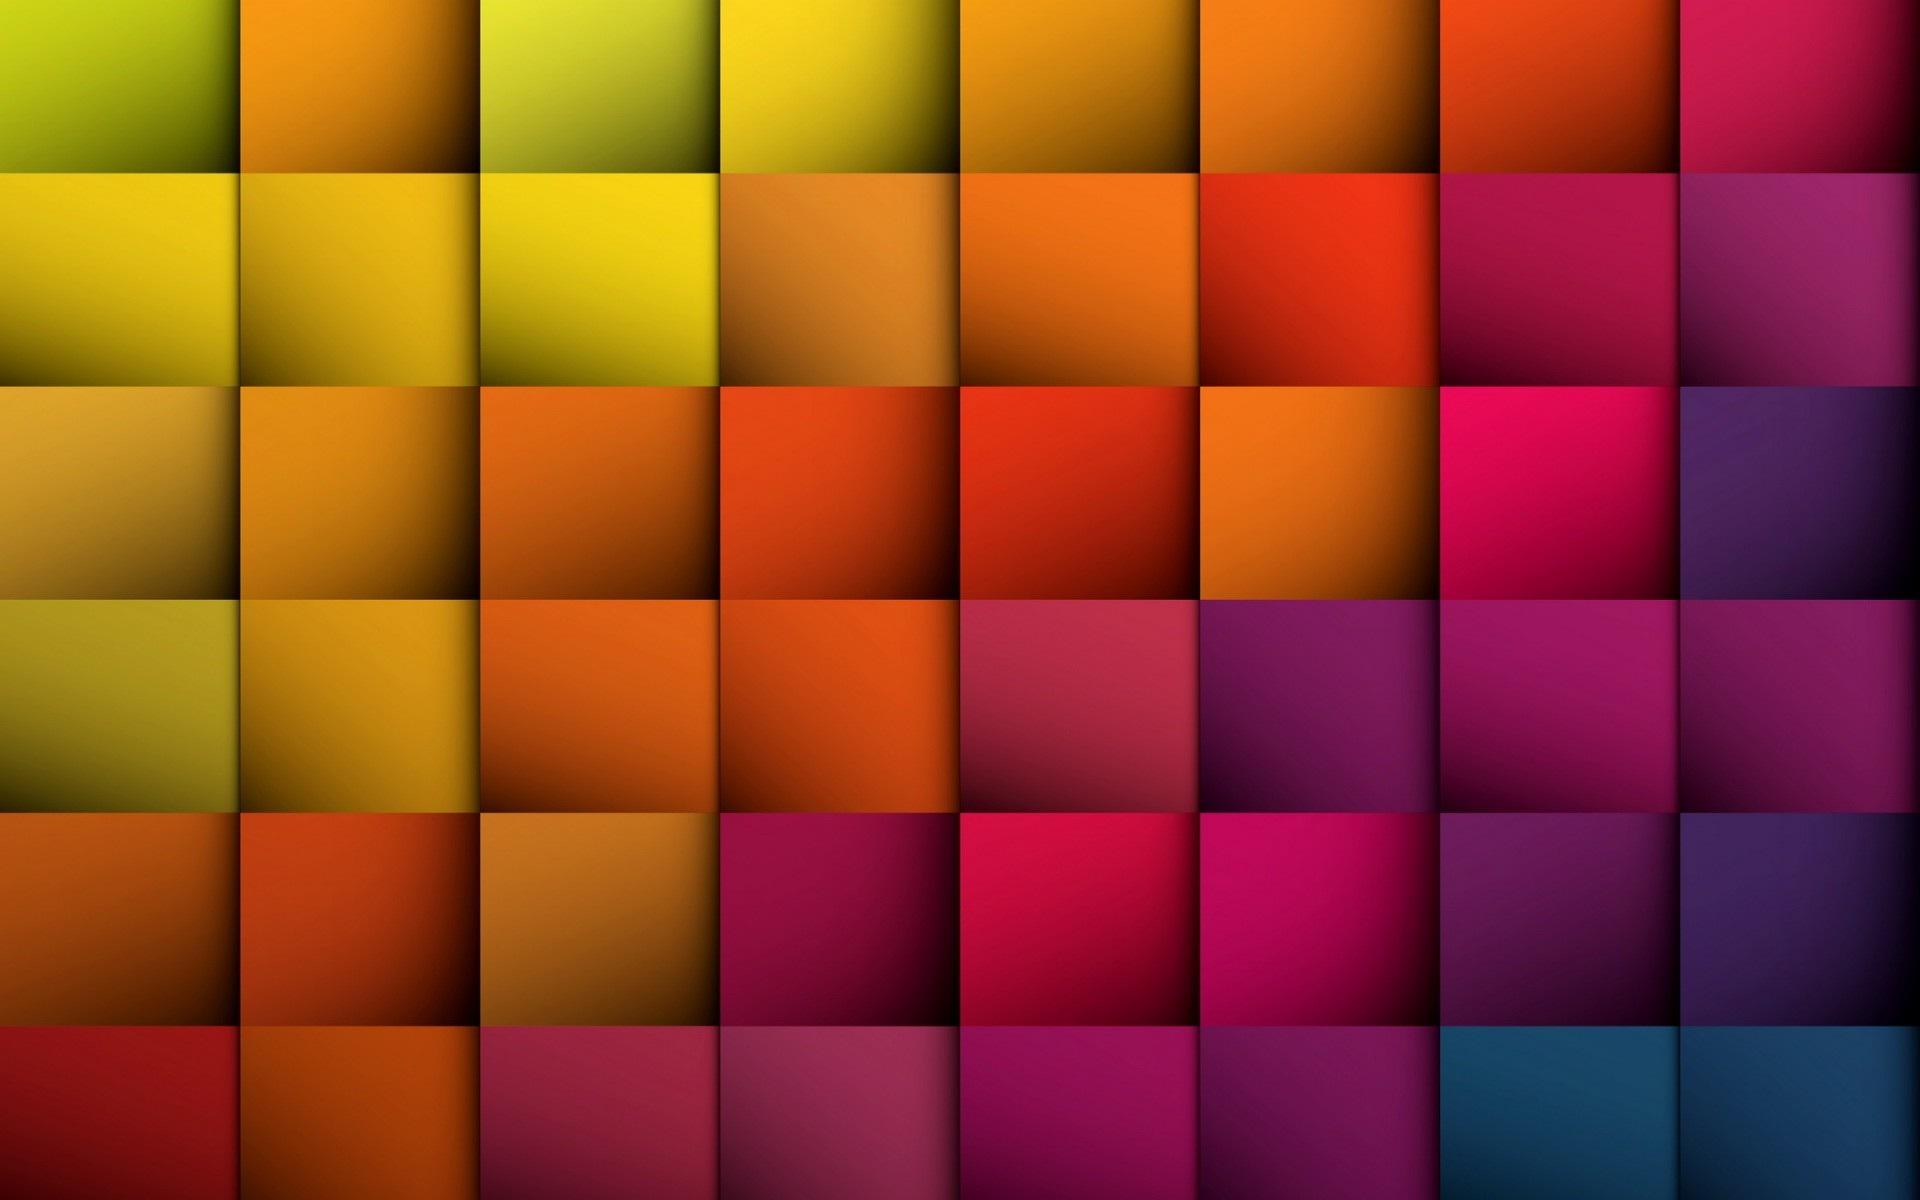 Free Fall Mobile Phone Wallpapers Desktop Color Hd Wallpapers Pixelstalk Net